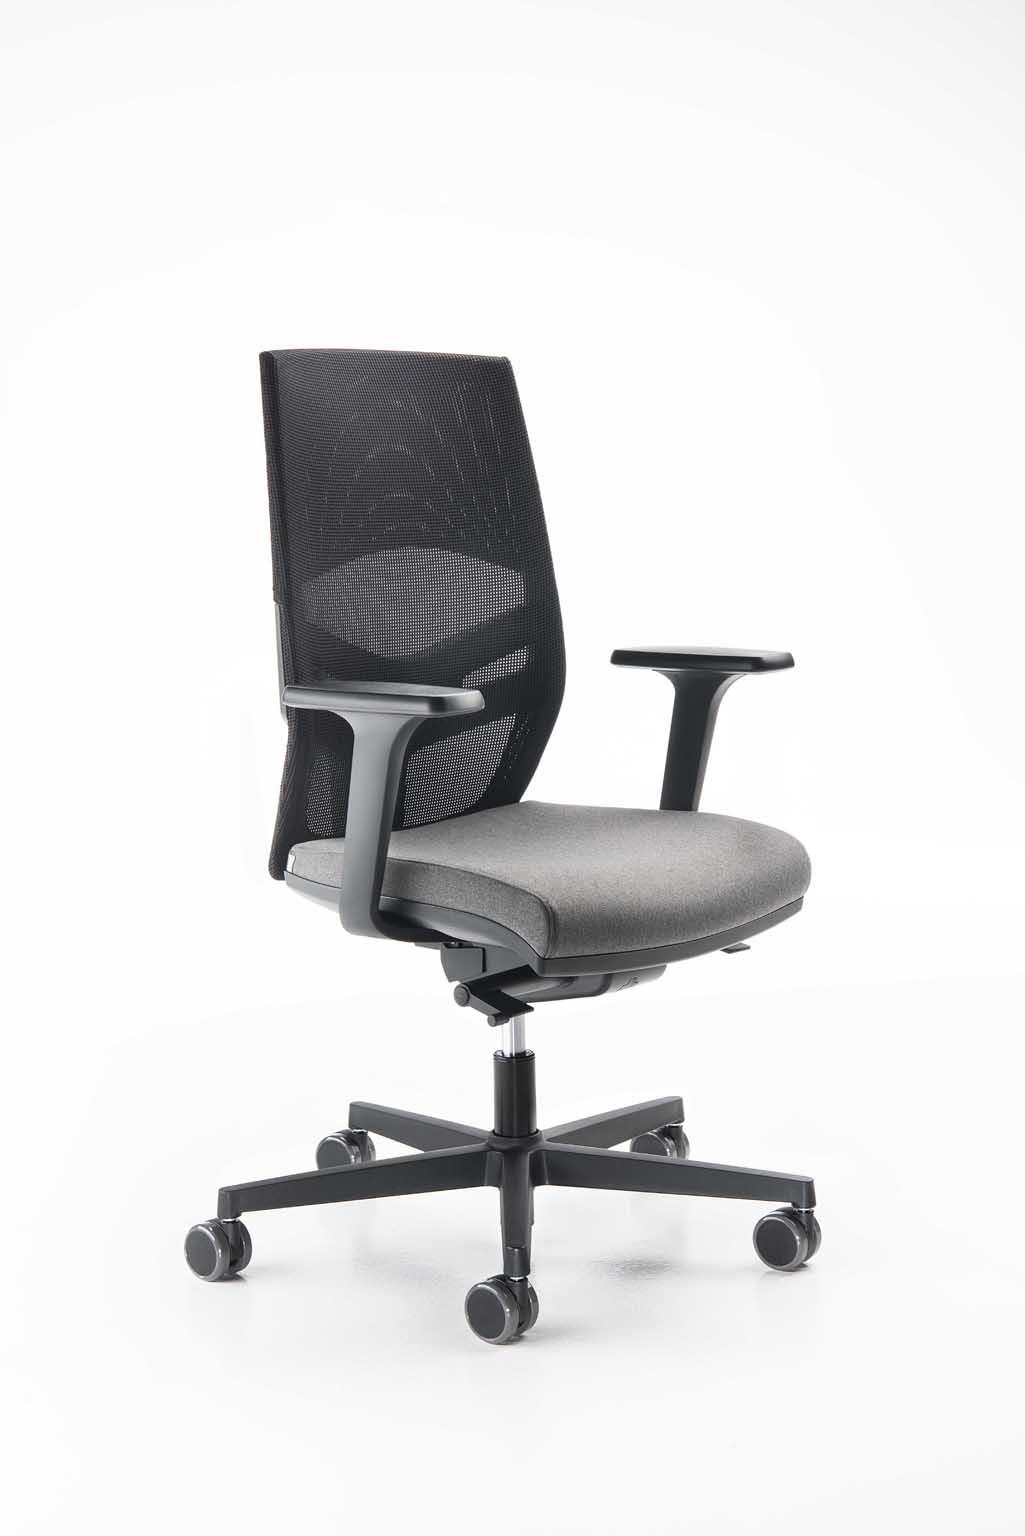 Silla de oficina, moderno, elegante, ajustable | IDFdesign